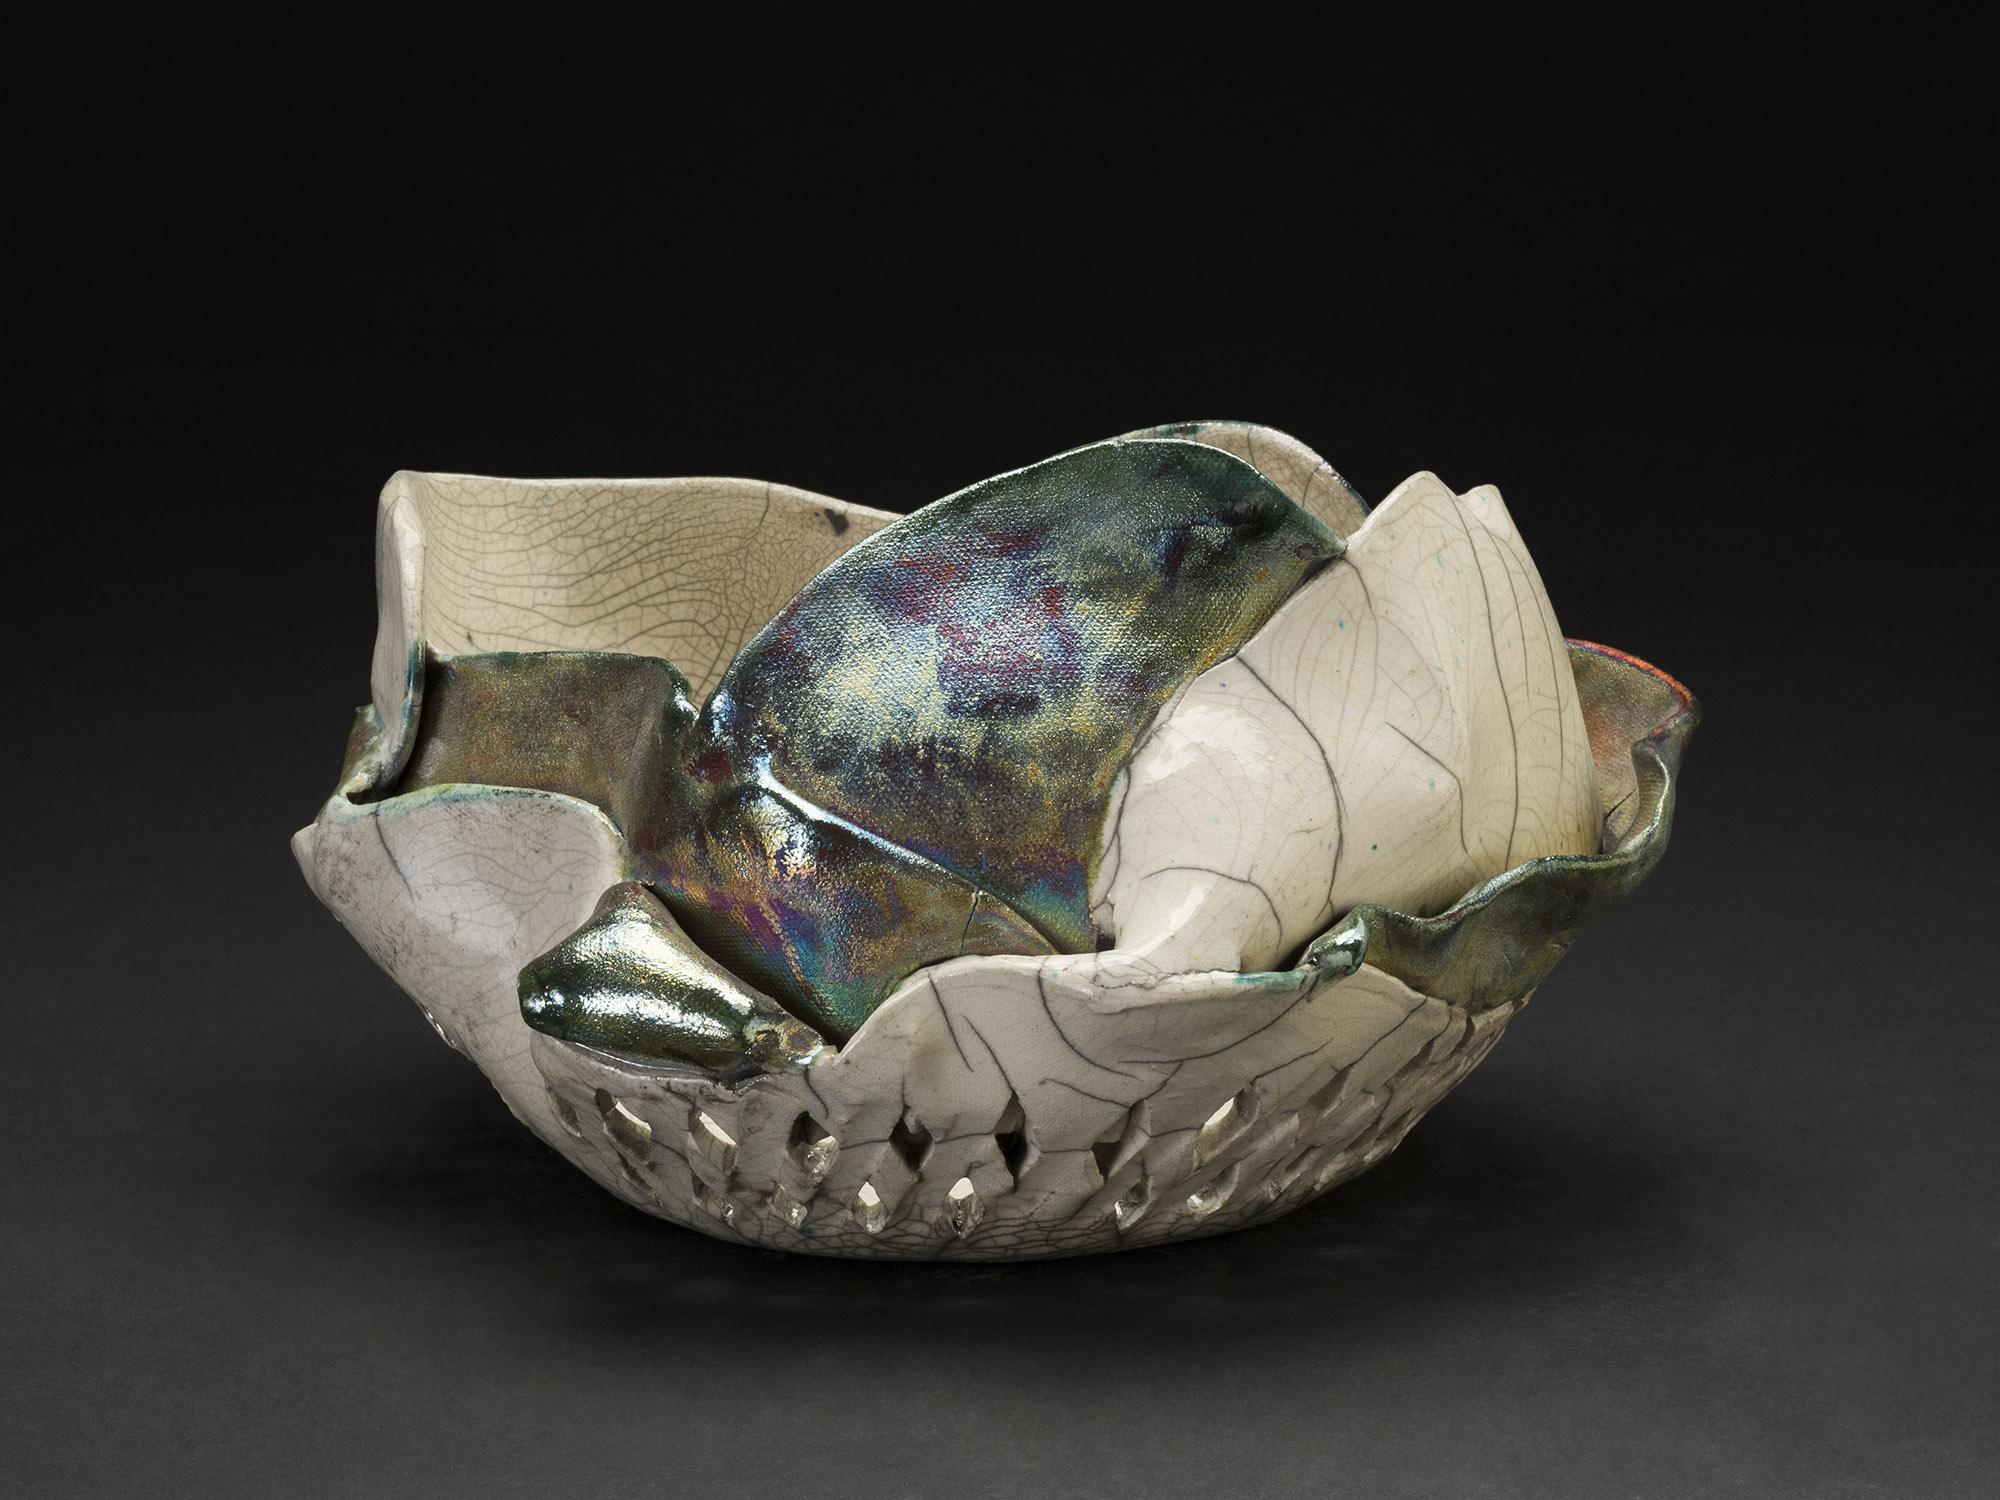 Nancy Brorby    Untitled  , c. 1992-2004 Ceramic 10 x 11 x 6.5 inches 25.4 x 27.9 x 16.5 cm NBr 6